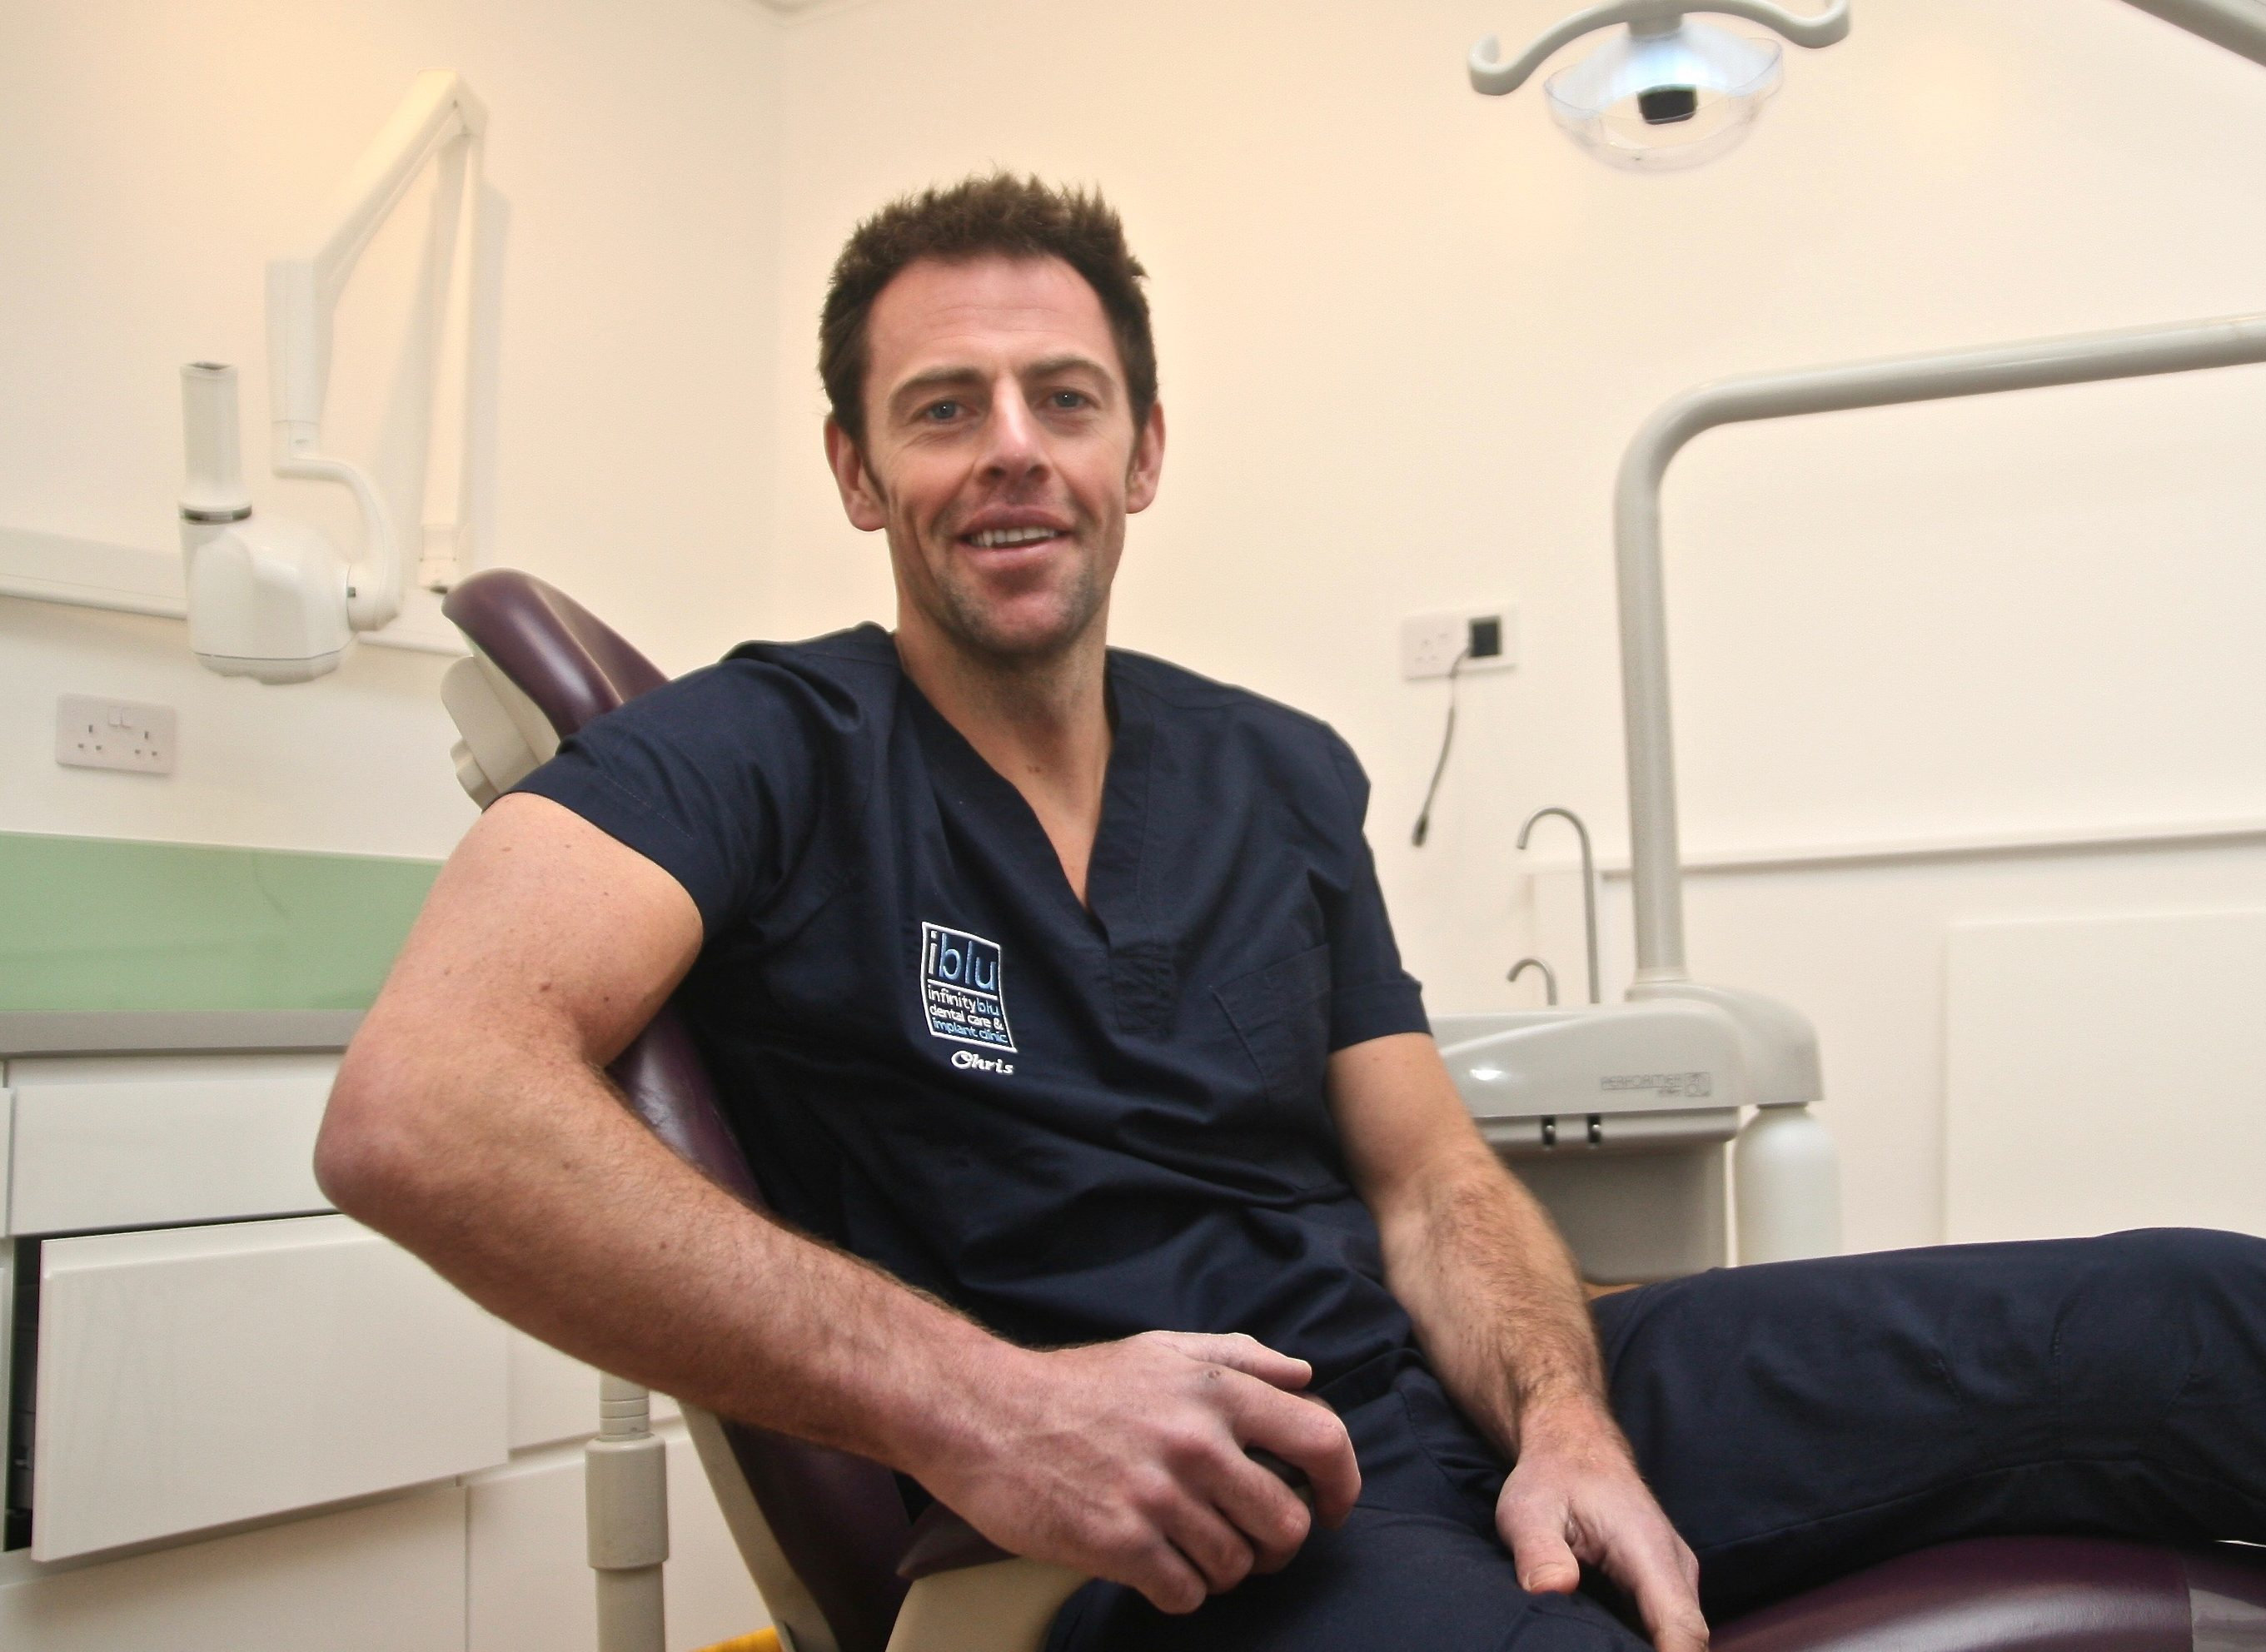 Chris had to undergo dental reconstruction following the crash.